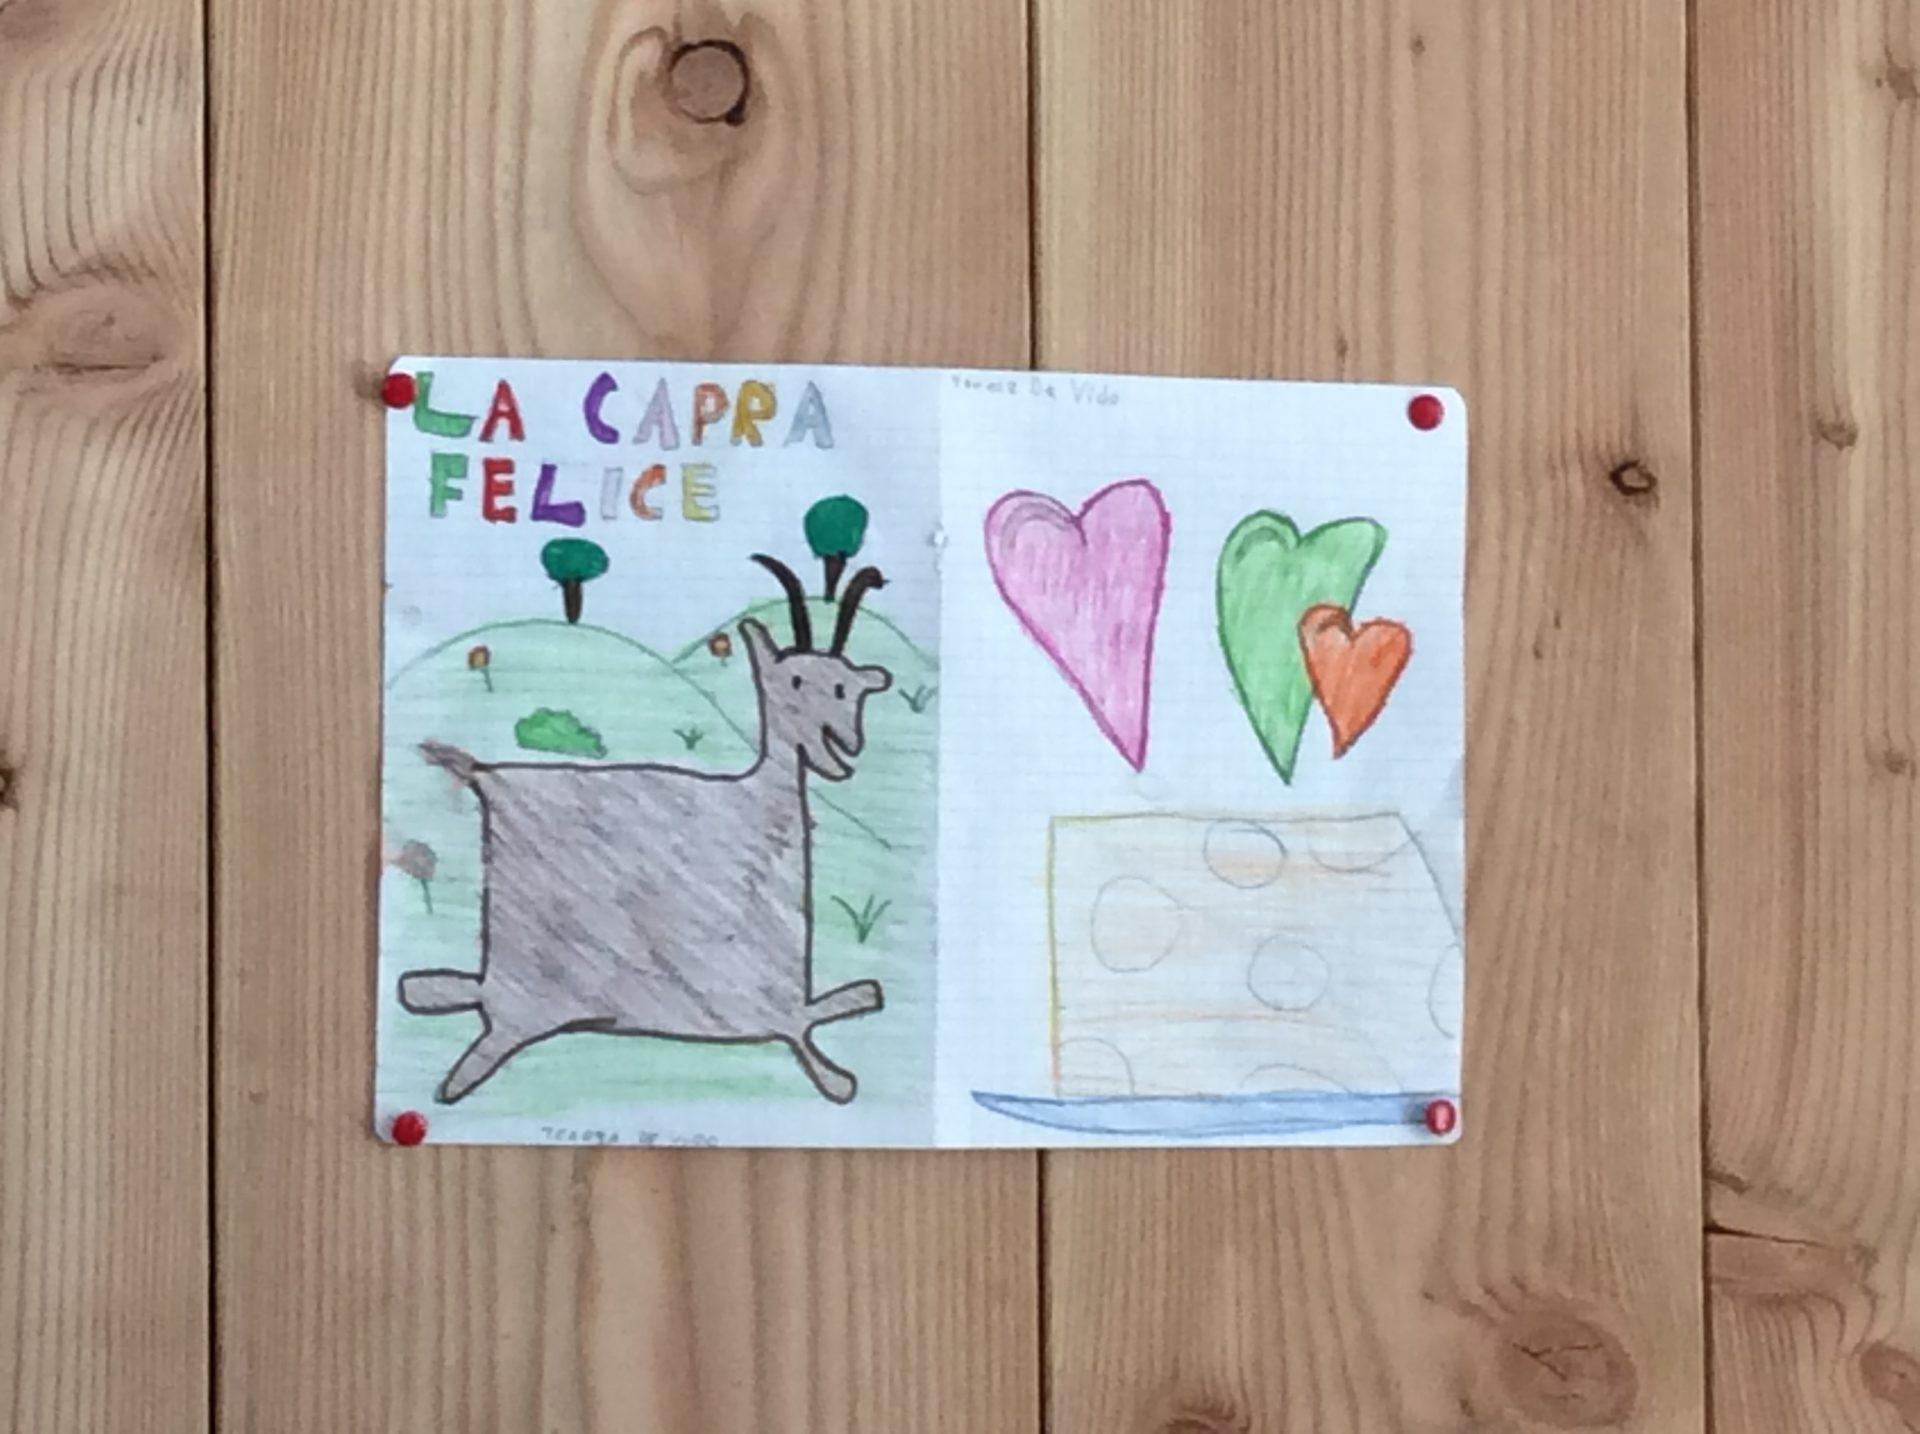 La-Capra-felice-disegno